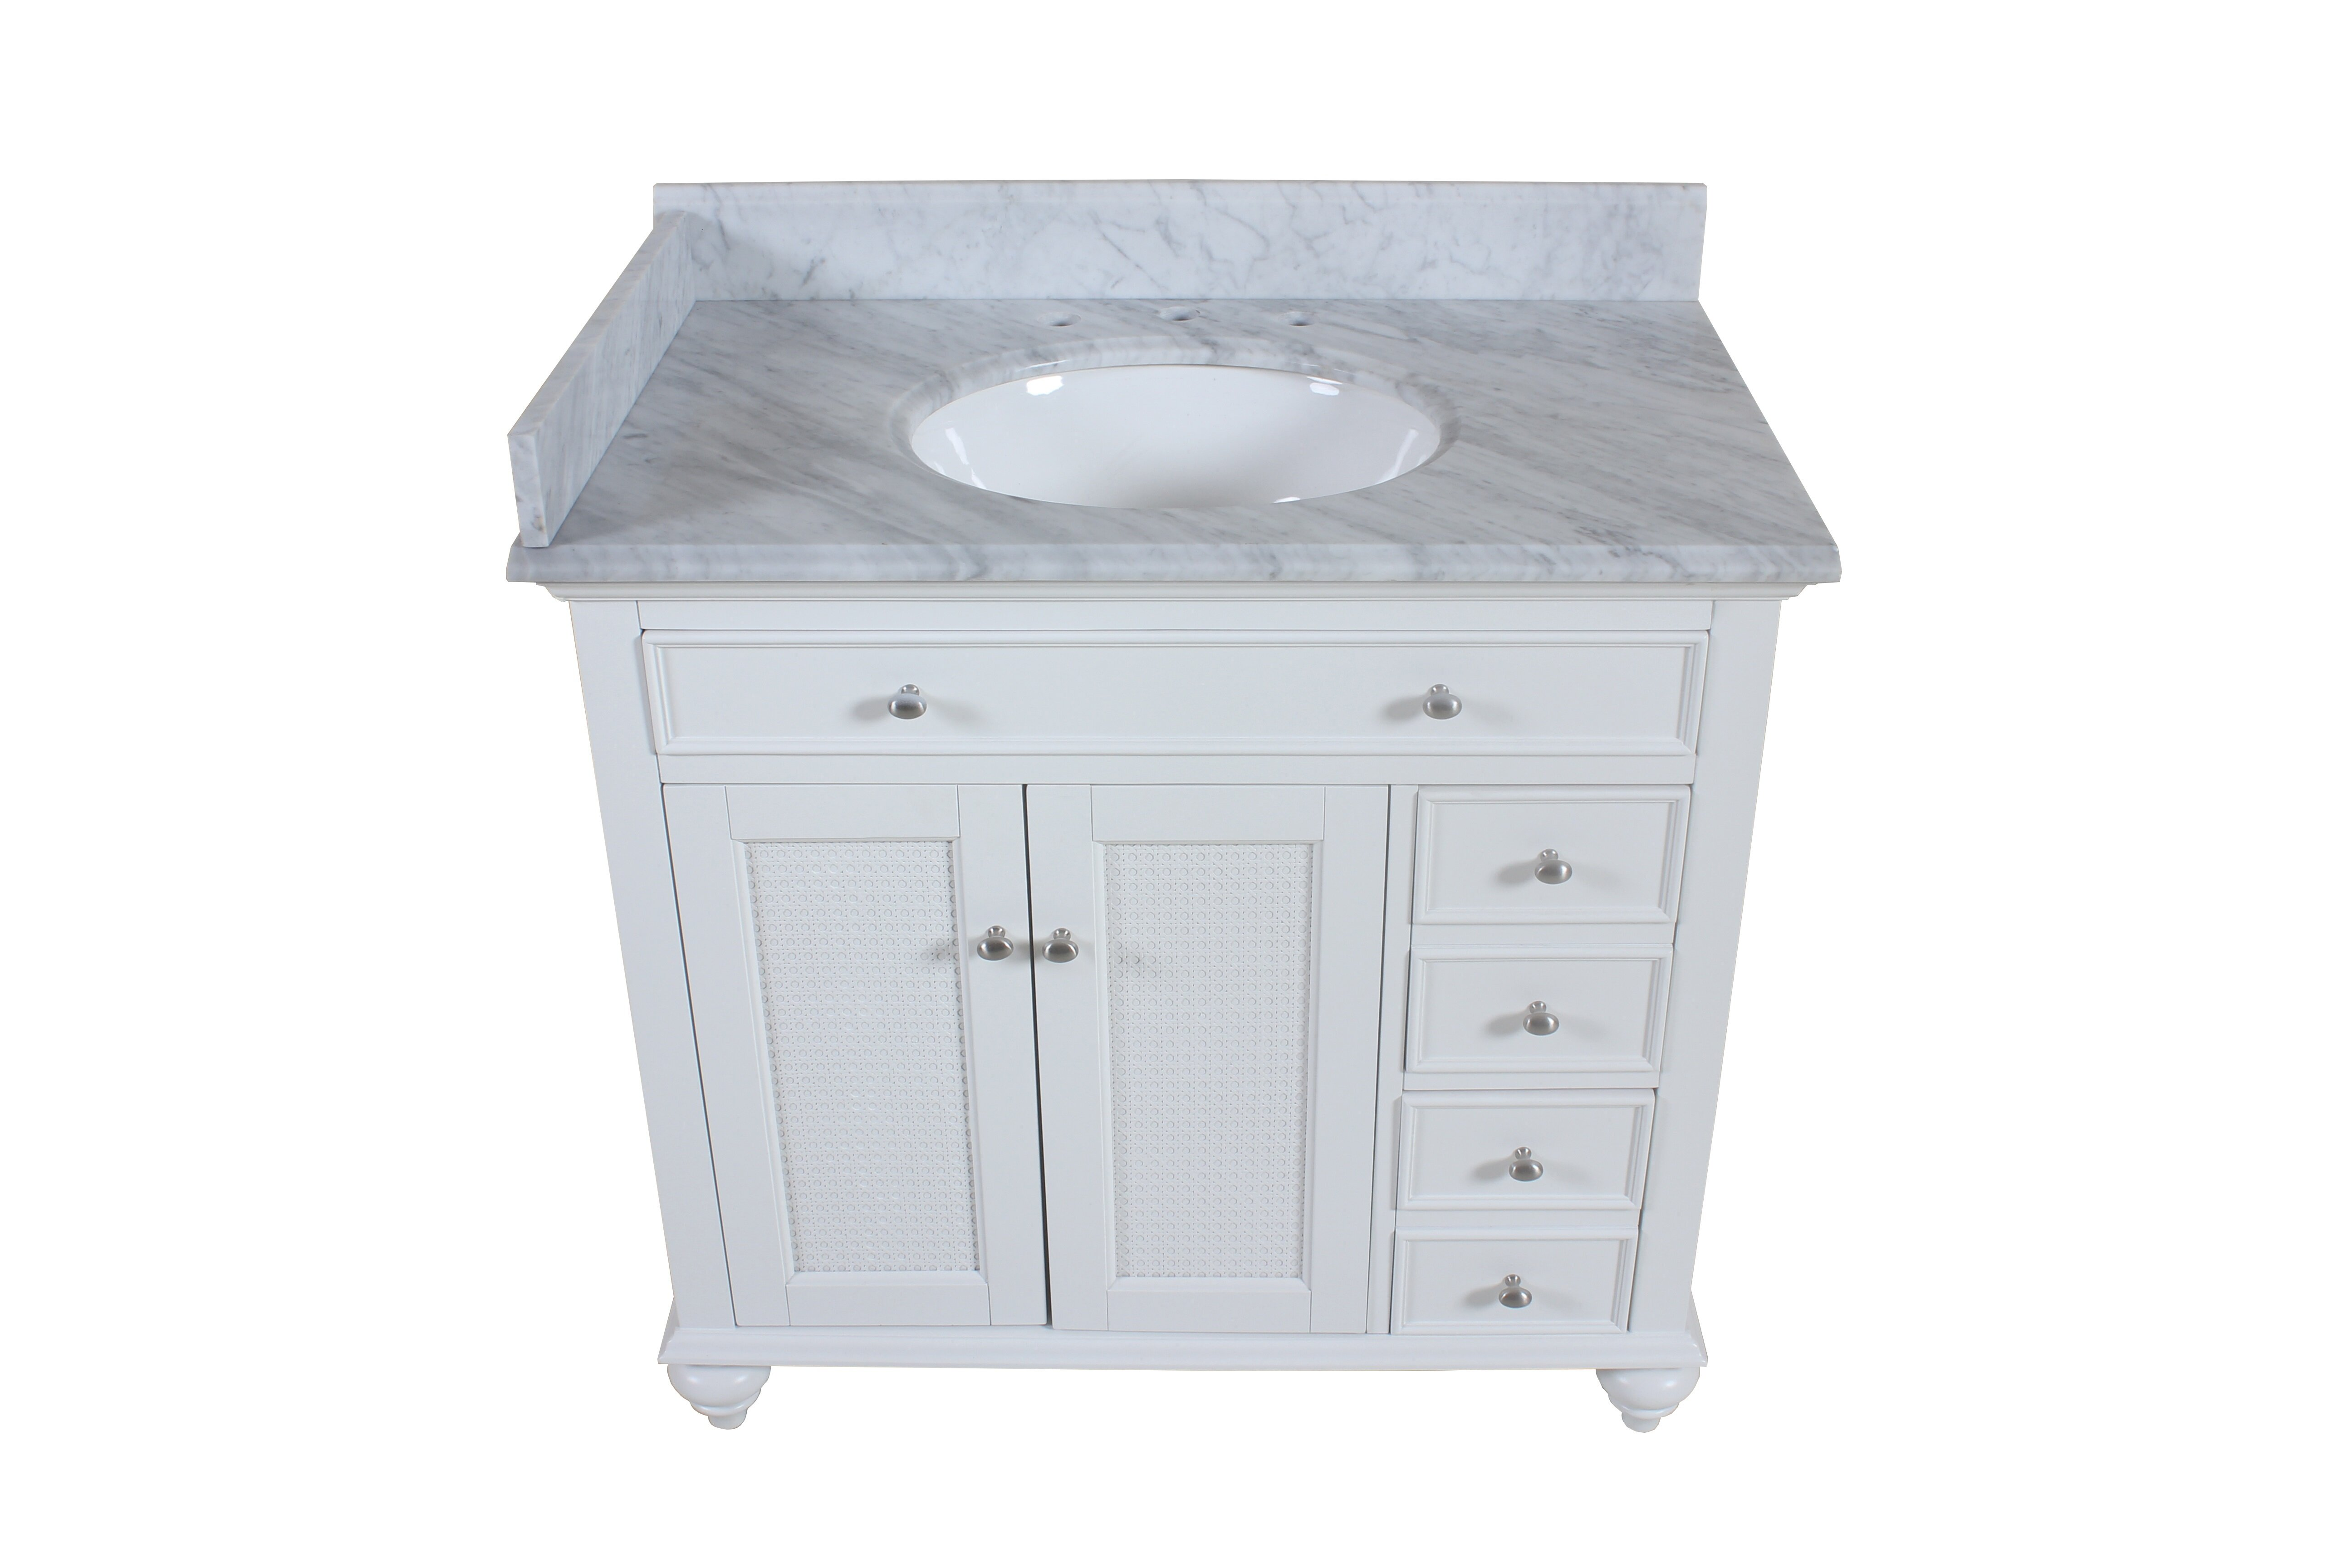 Carrara Marble Side Splash